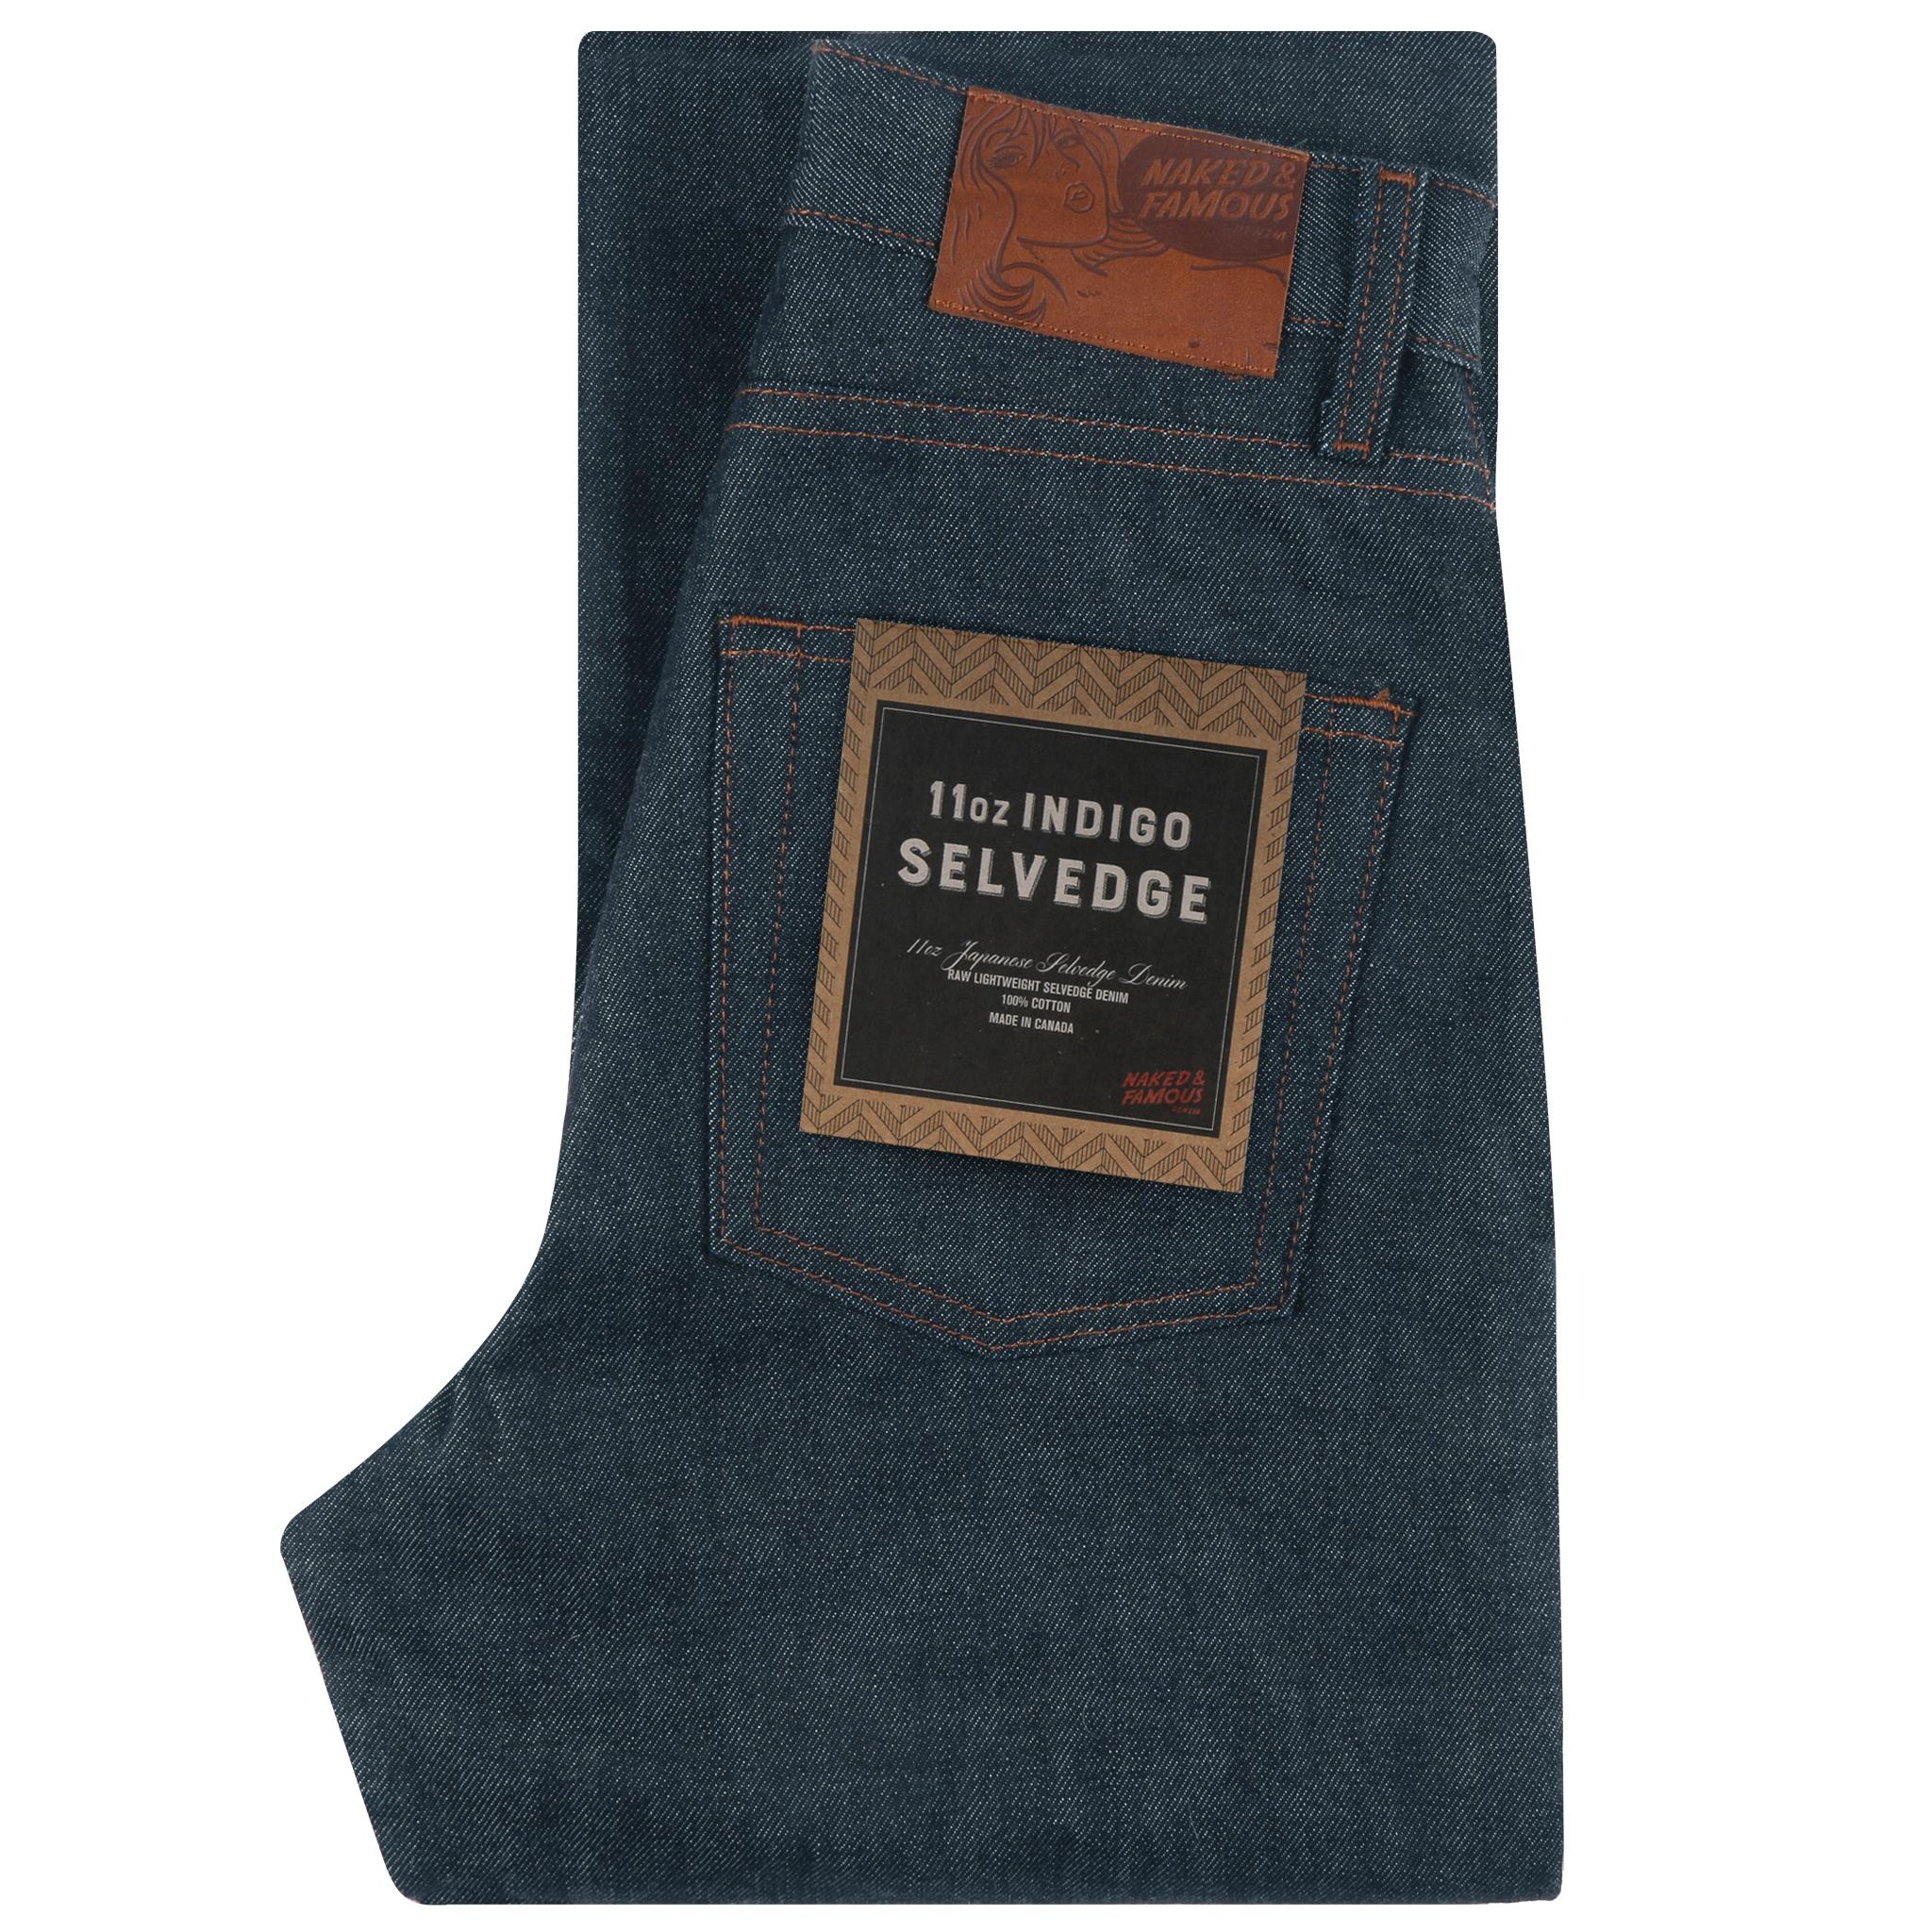 Women's 11oz Indigo Selvedge jeans folded view